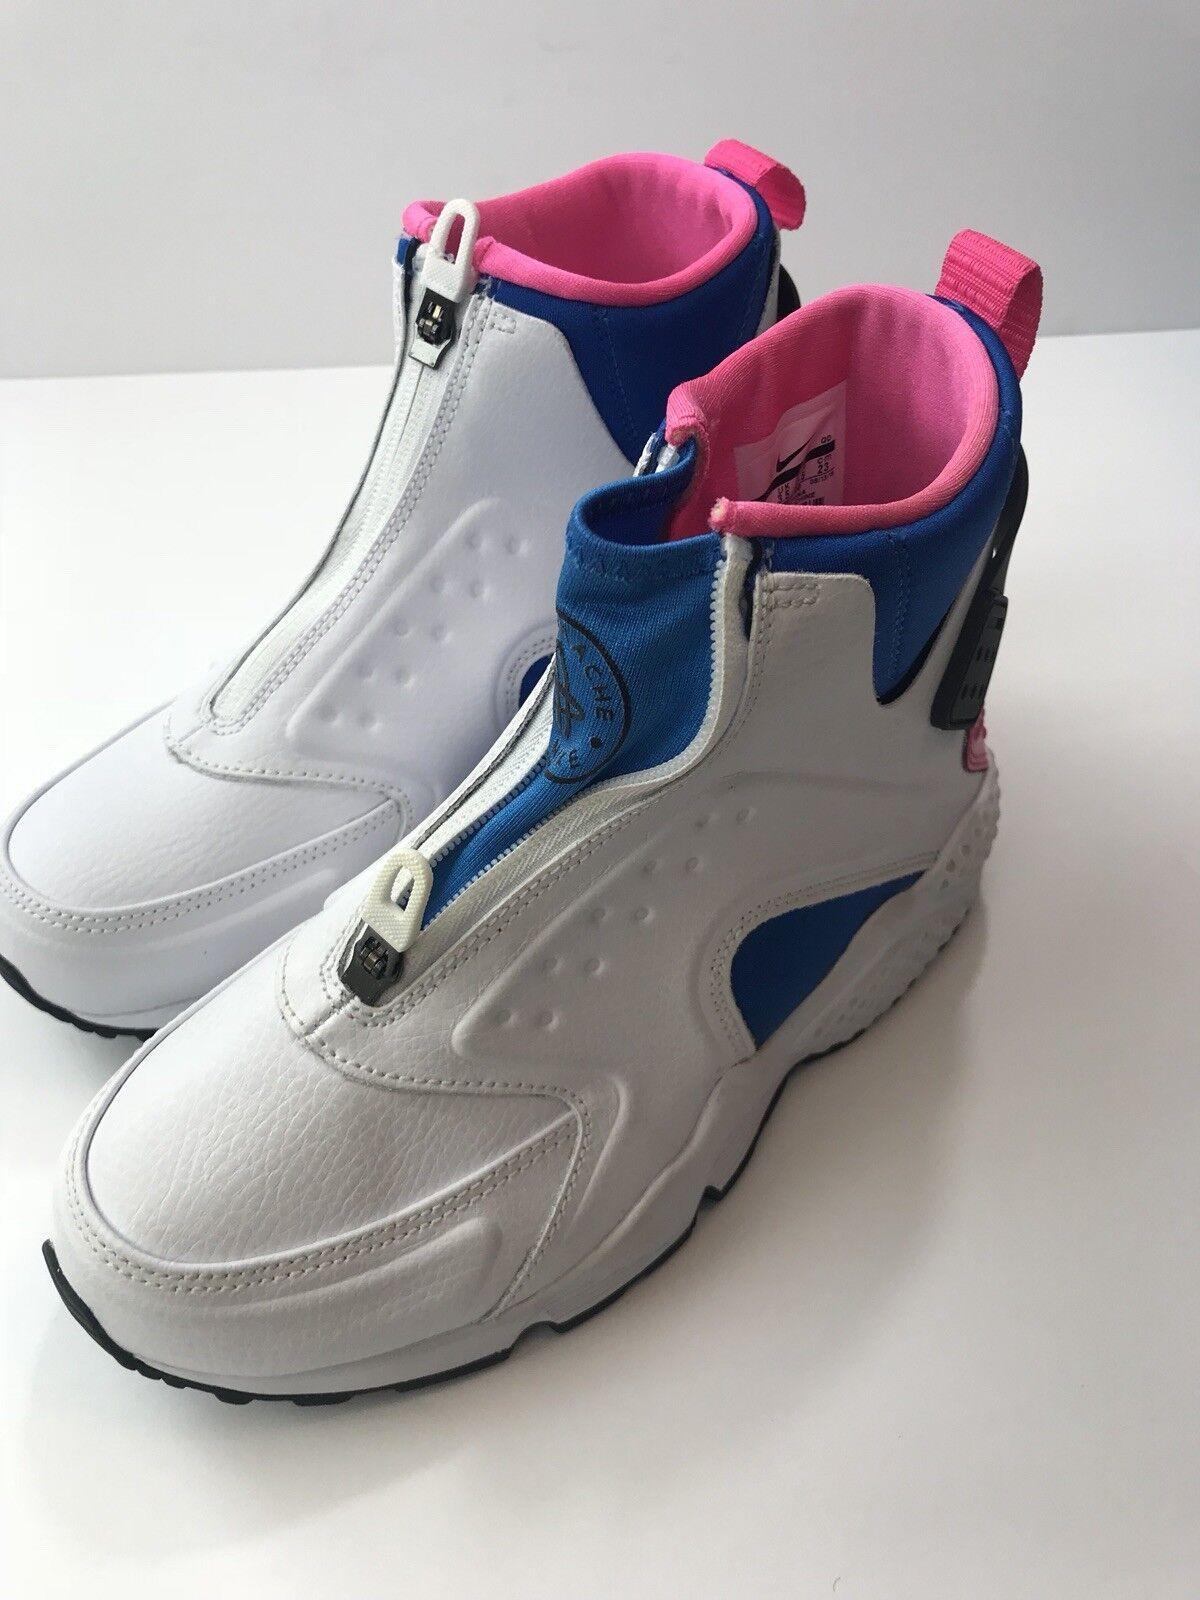 NIKE AIR HUARACHE RUN MID 807313-100 White Black Soar Pink Pow Women's Sz 6 Seasonal price cuts, discount benefits